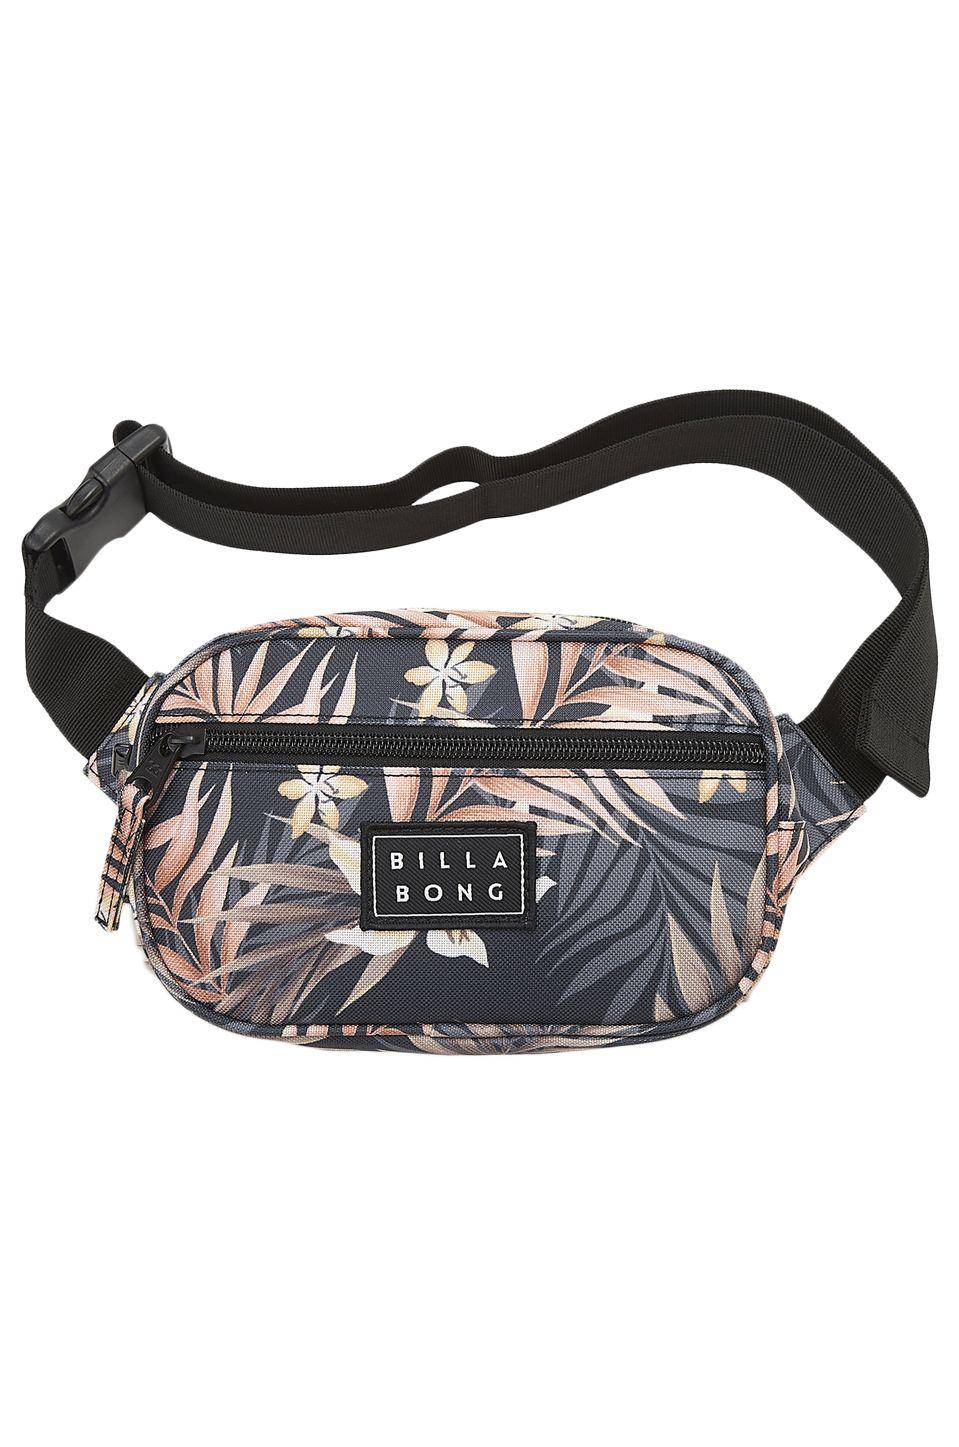 Billabong Waist Bag DON'T STOP Black/Army